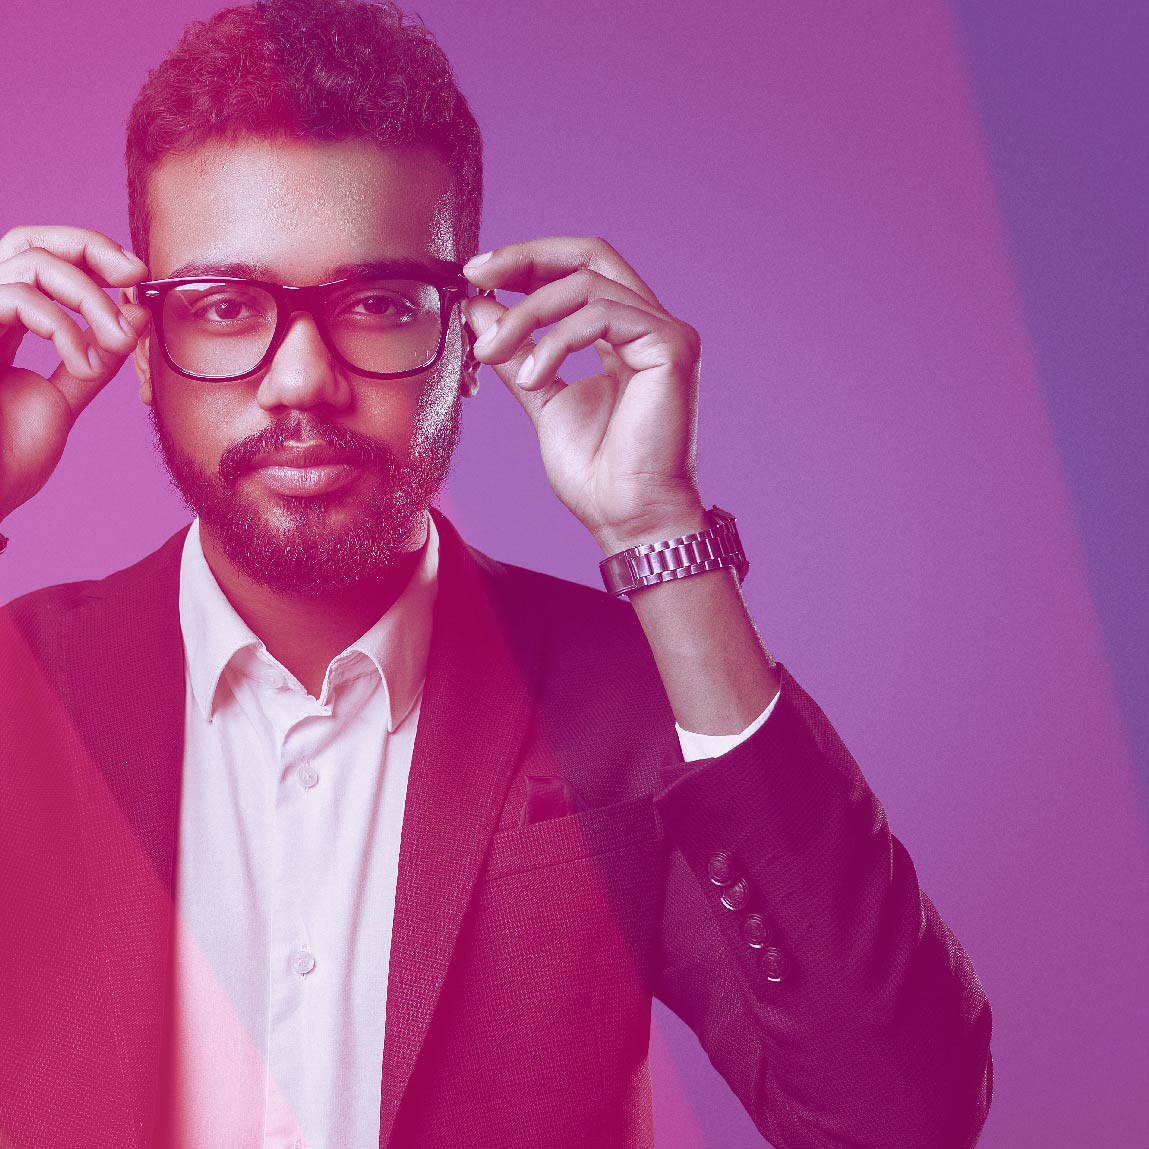 FG Portraits - Young Indian Man w Glasses.jpg